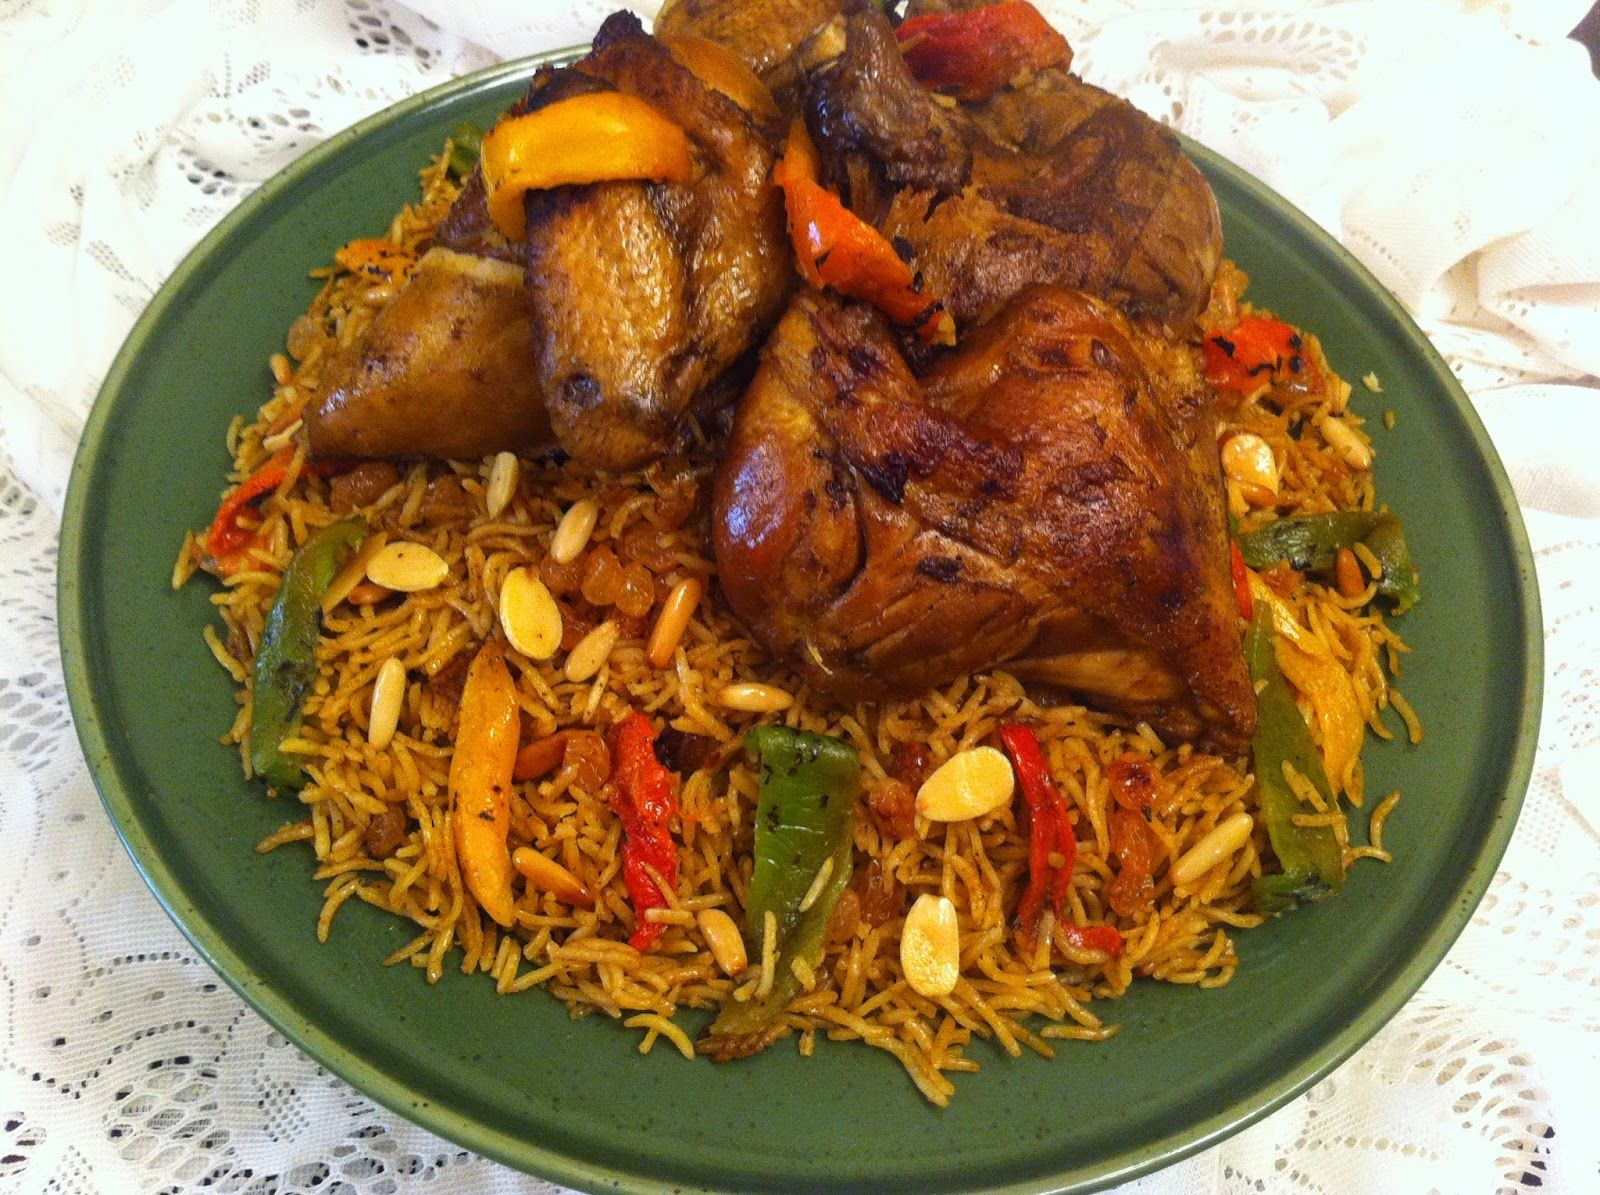 مطبخ ضياء Diaa Cooks Arabic كبسة بالدجاج على طريقتي Cooking Recipes Cooking Recipes